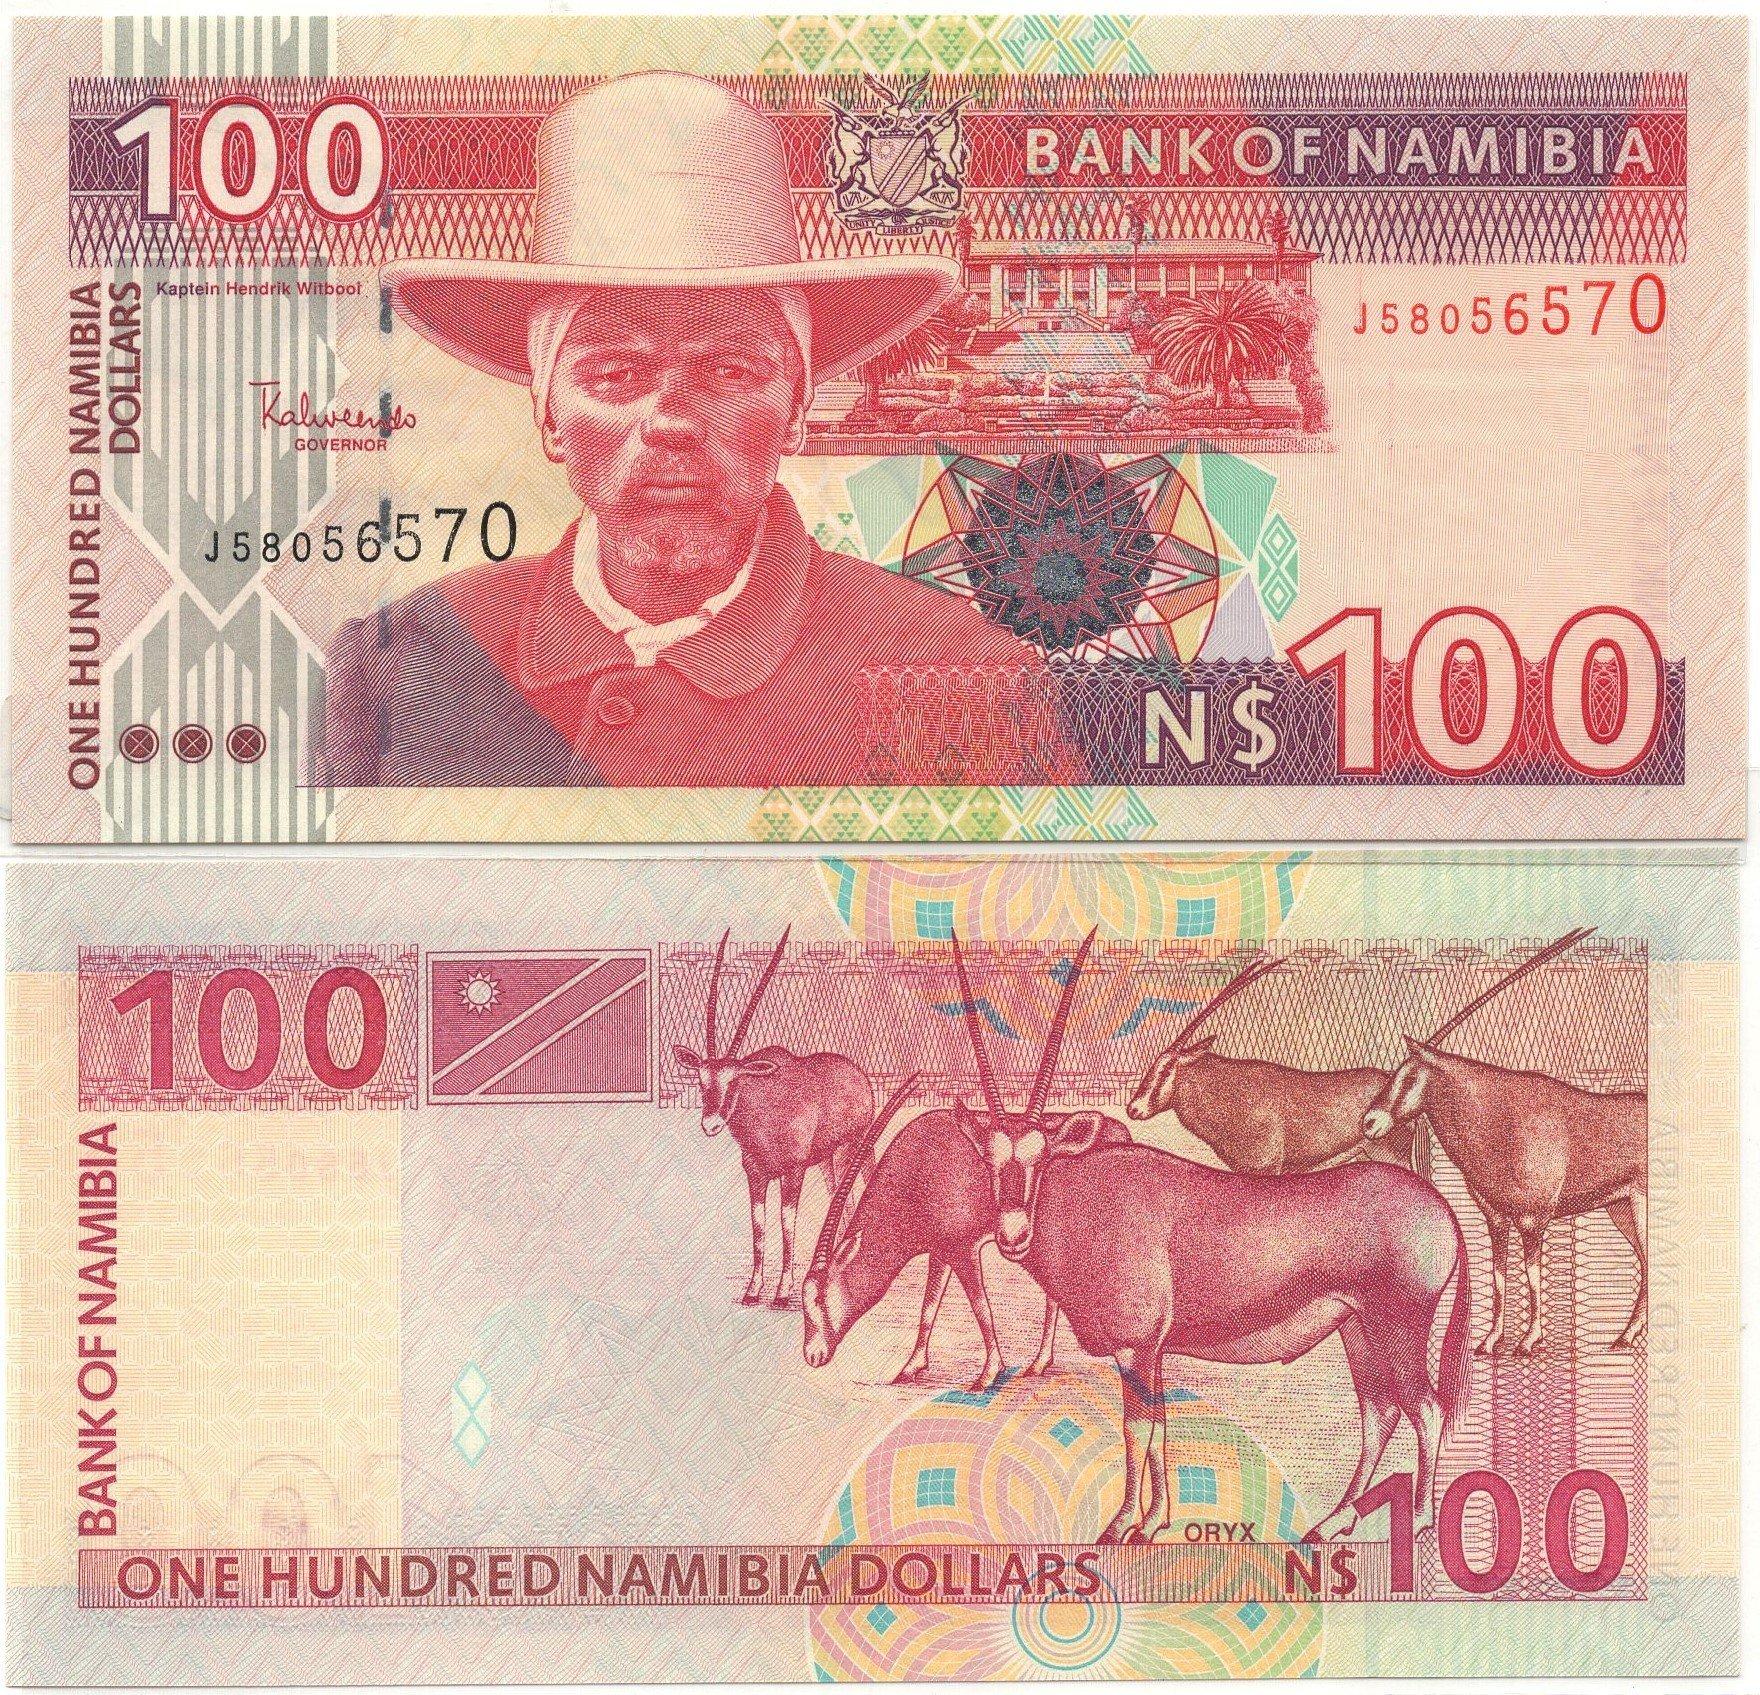 Namibia 100 dollars banknote